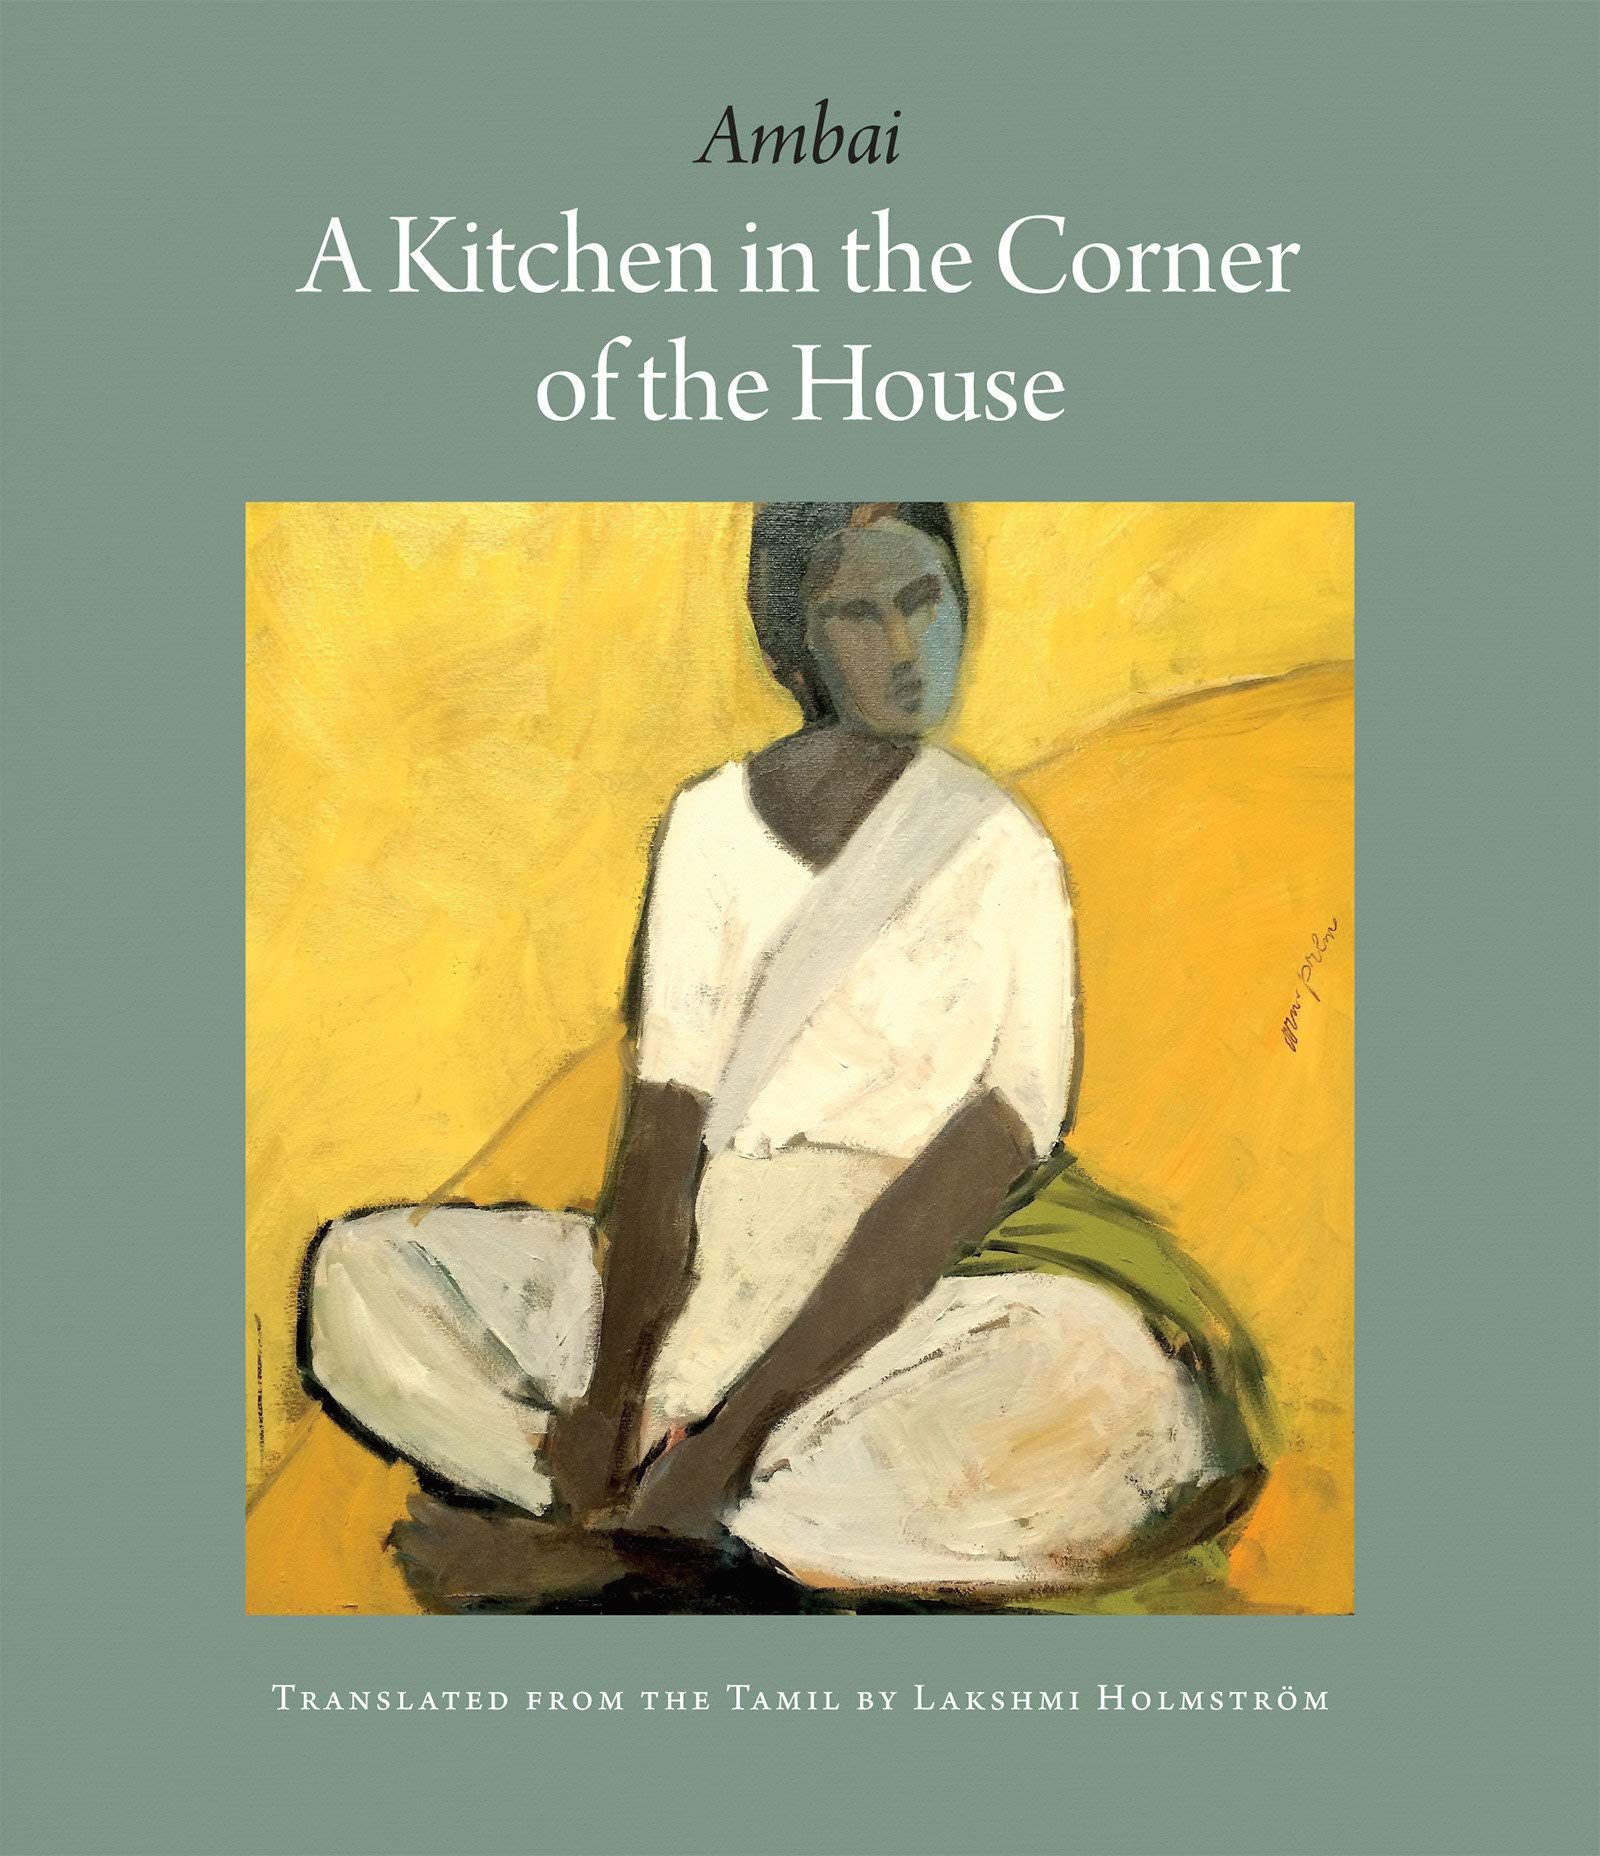 A Kitchen in the Corner of the House AMBAI, Holmström, Lakshmi ...